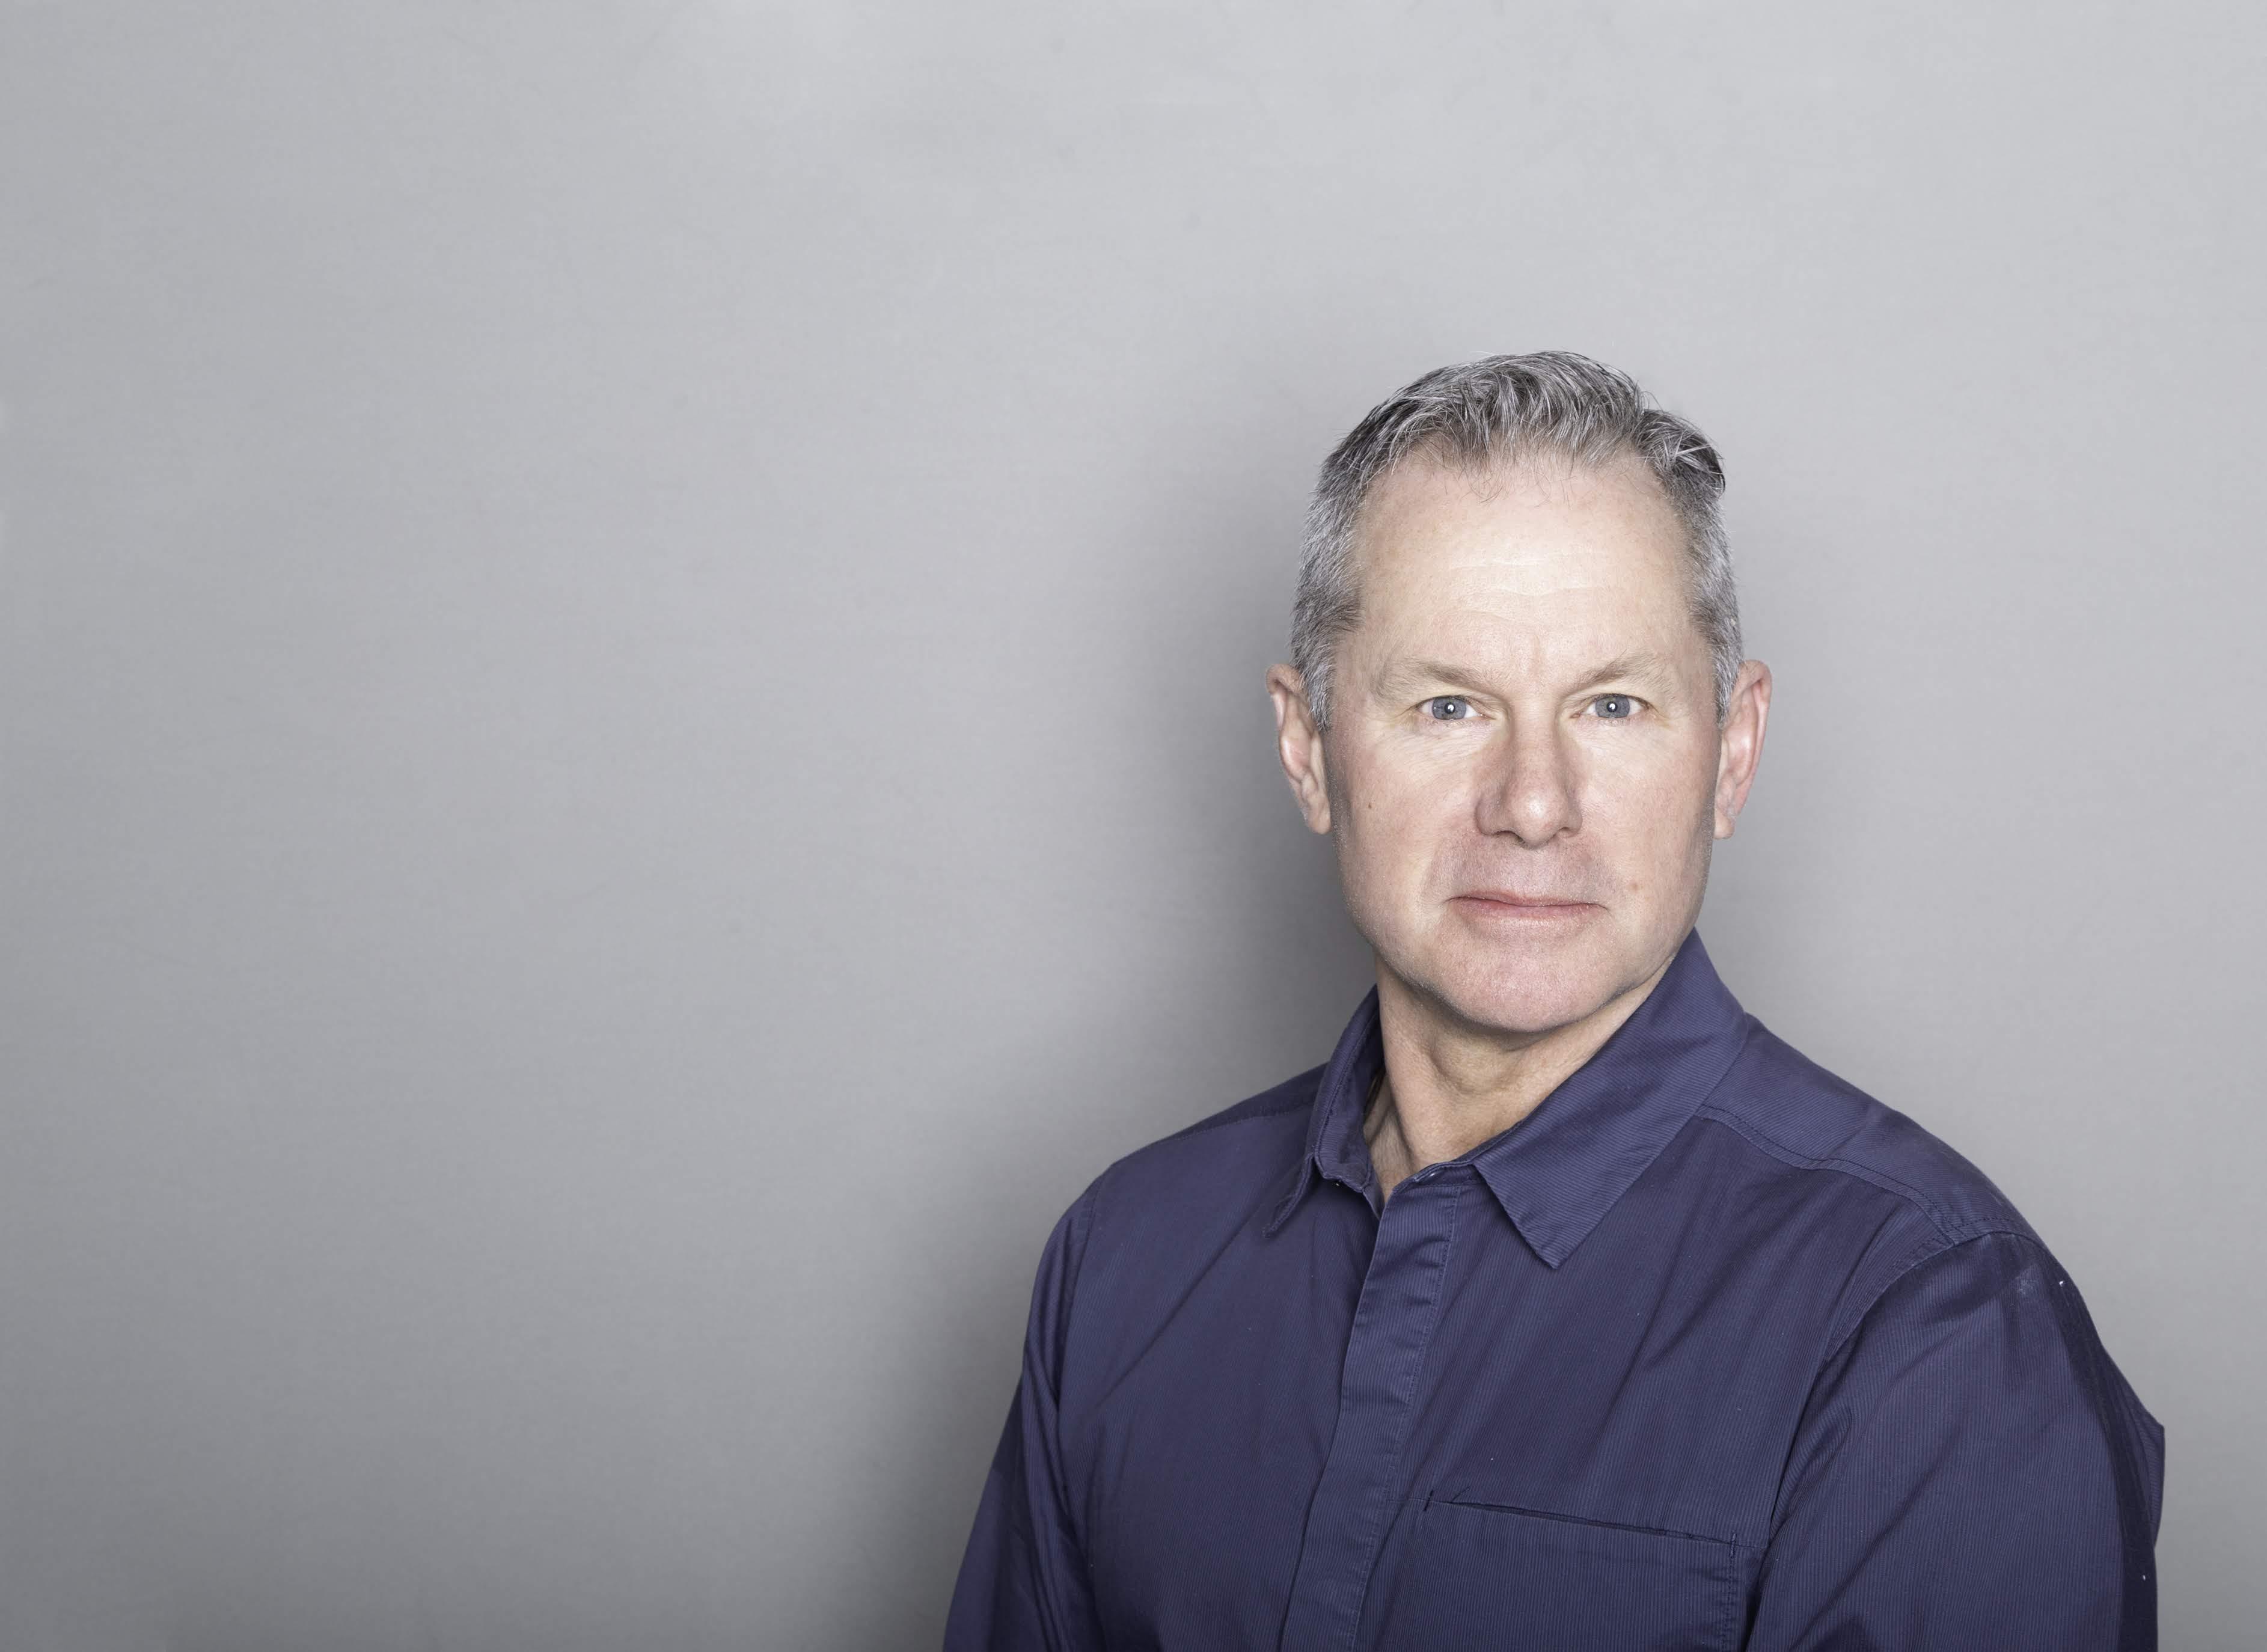 Kane michael headshot 2019mar1